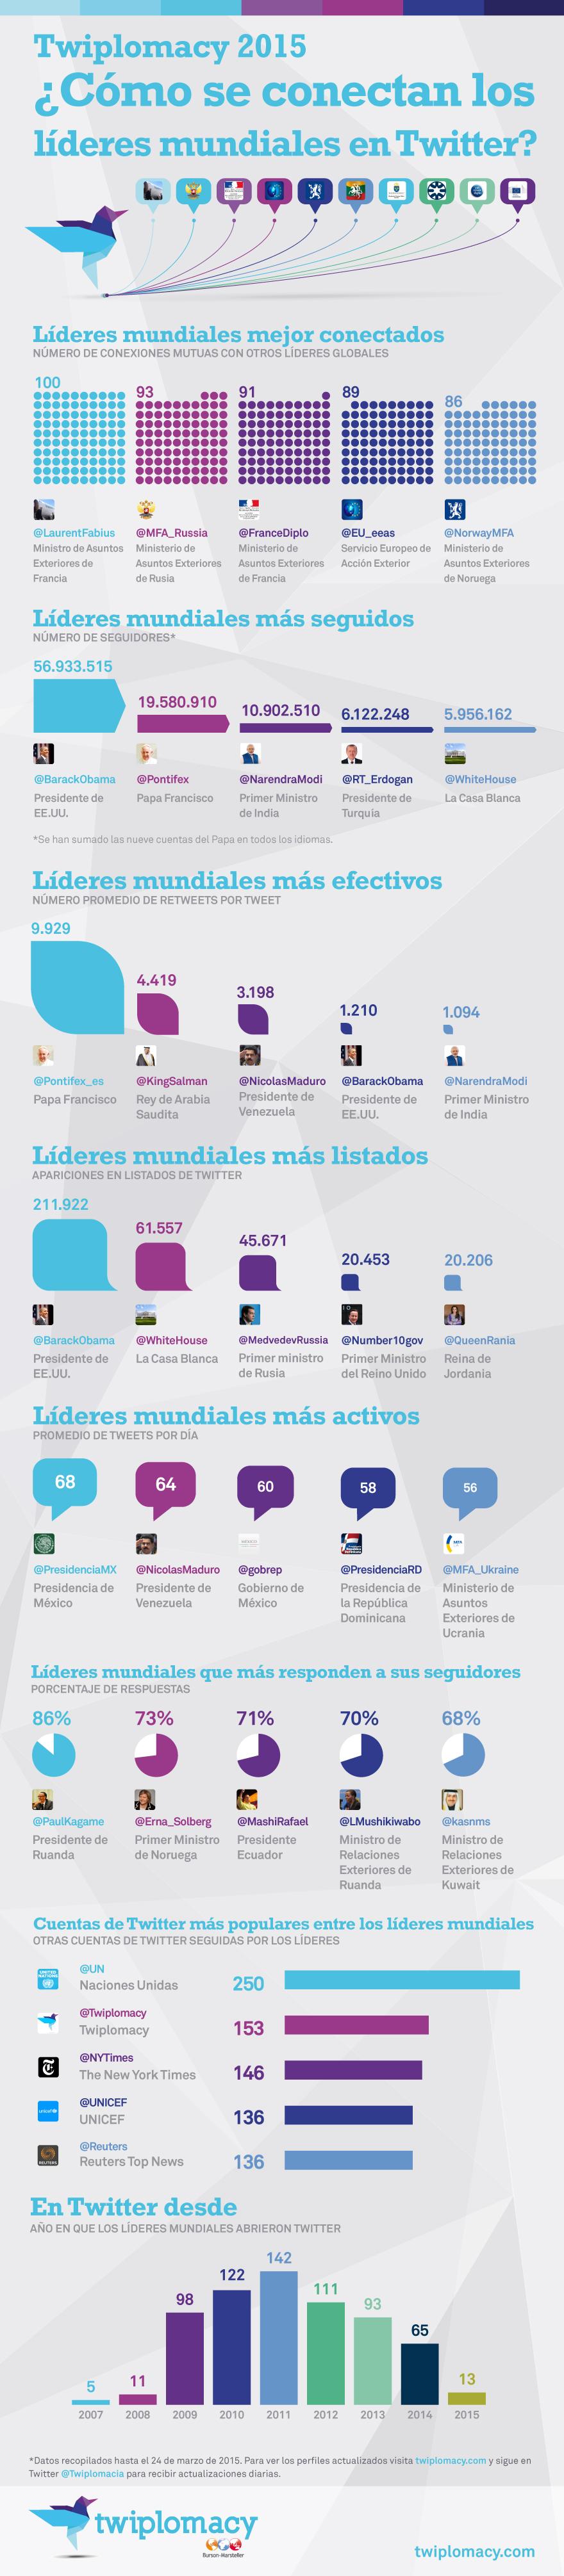 Twiplomacy_2015_Global_Infographic_Spanish